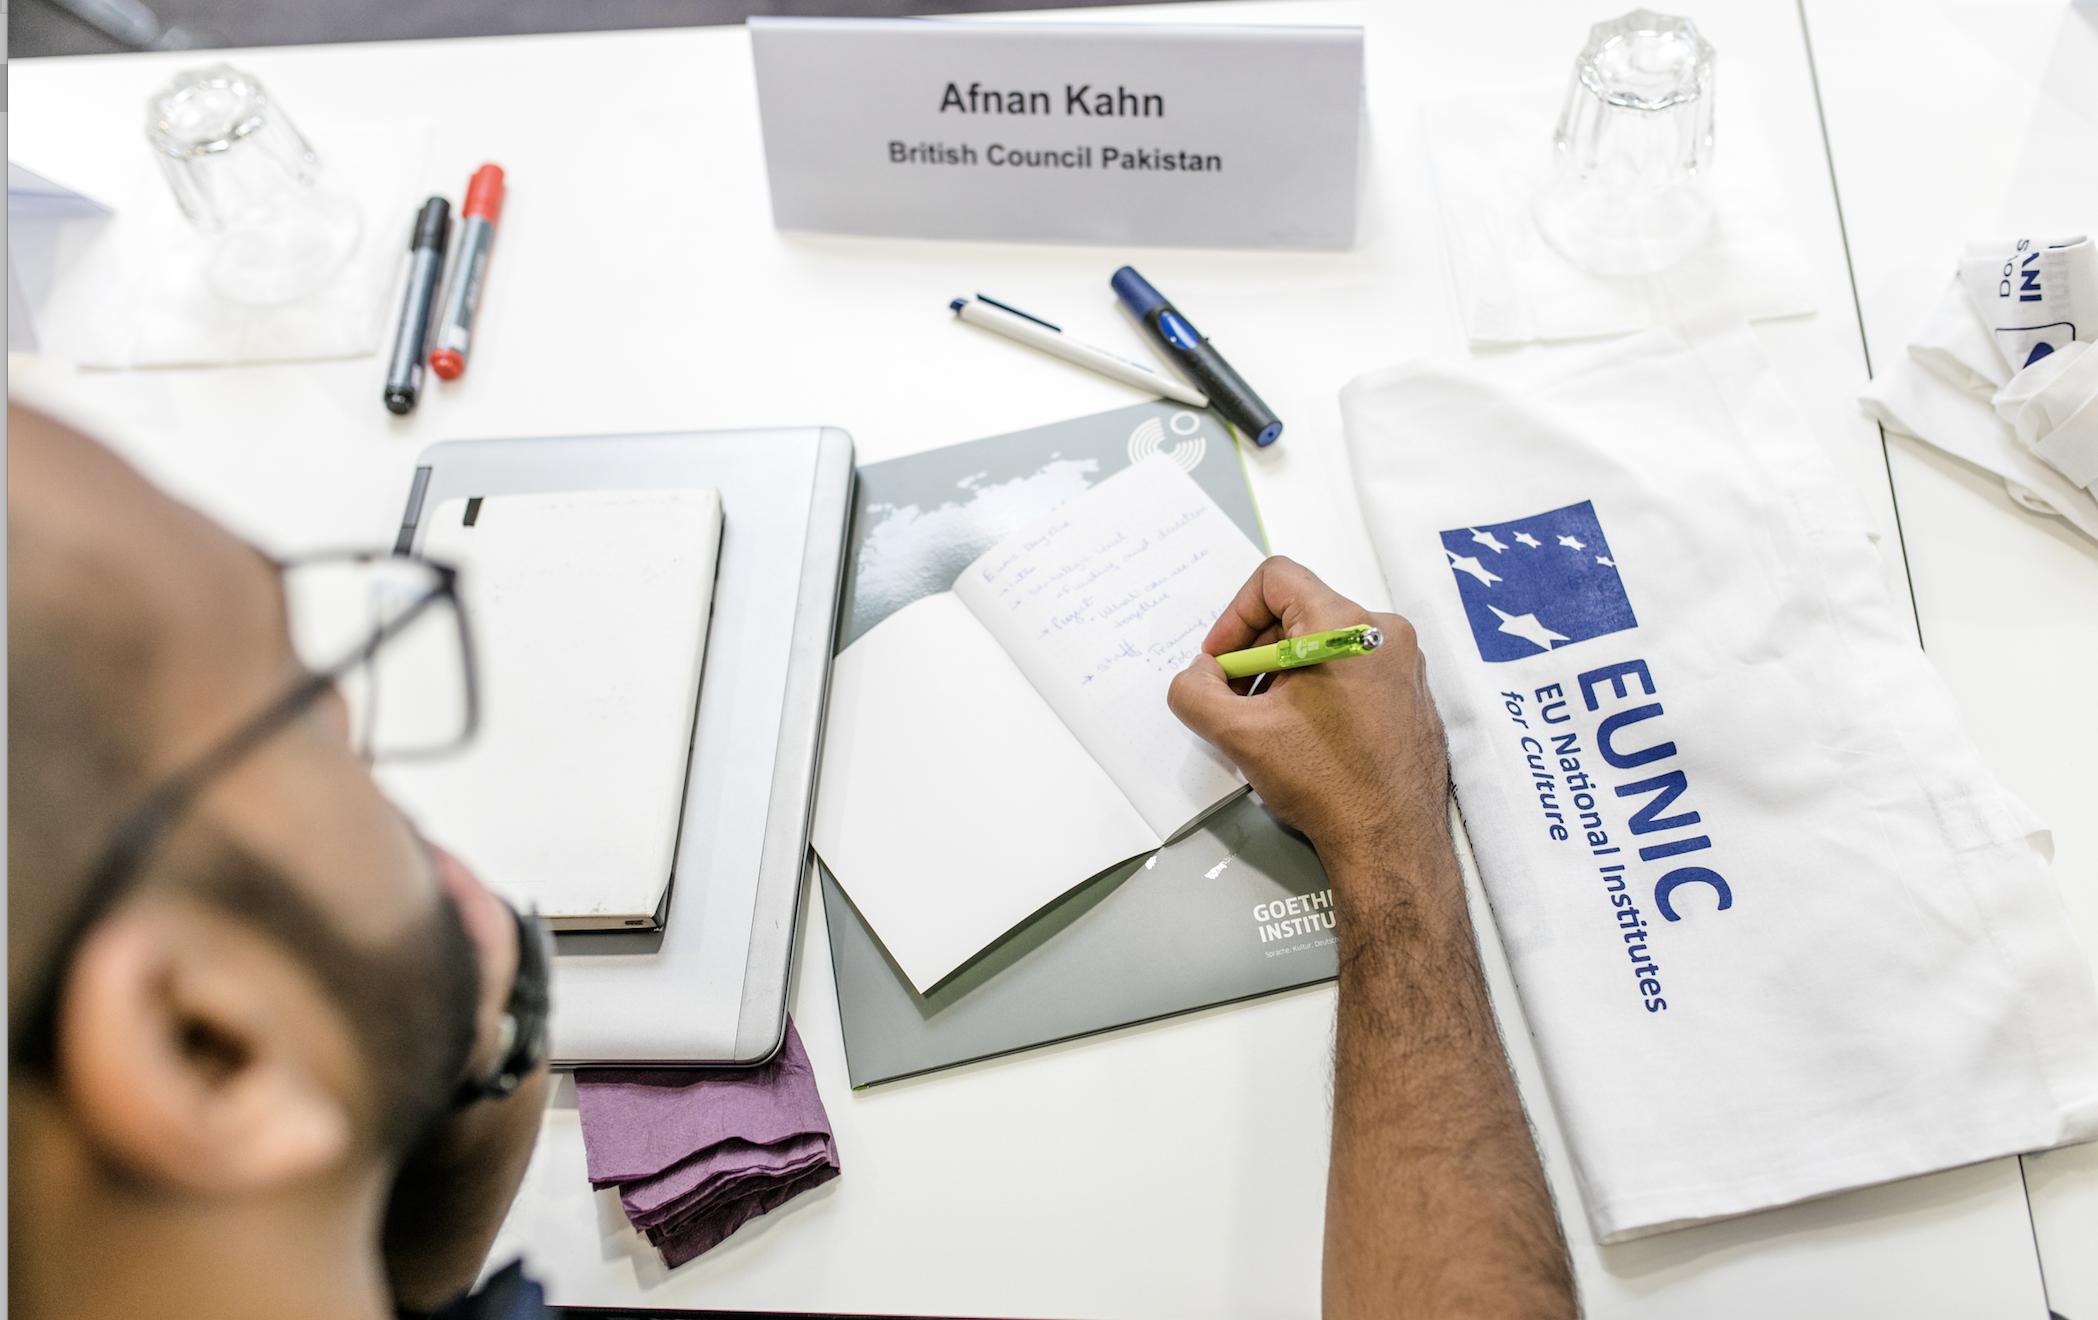 EUNIC - European Union National Institutes for Culture